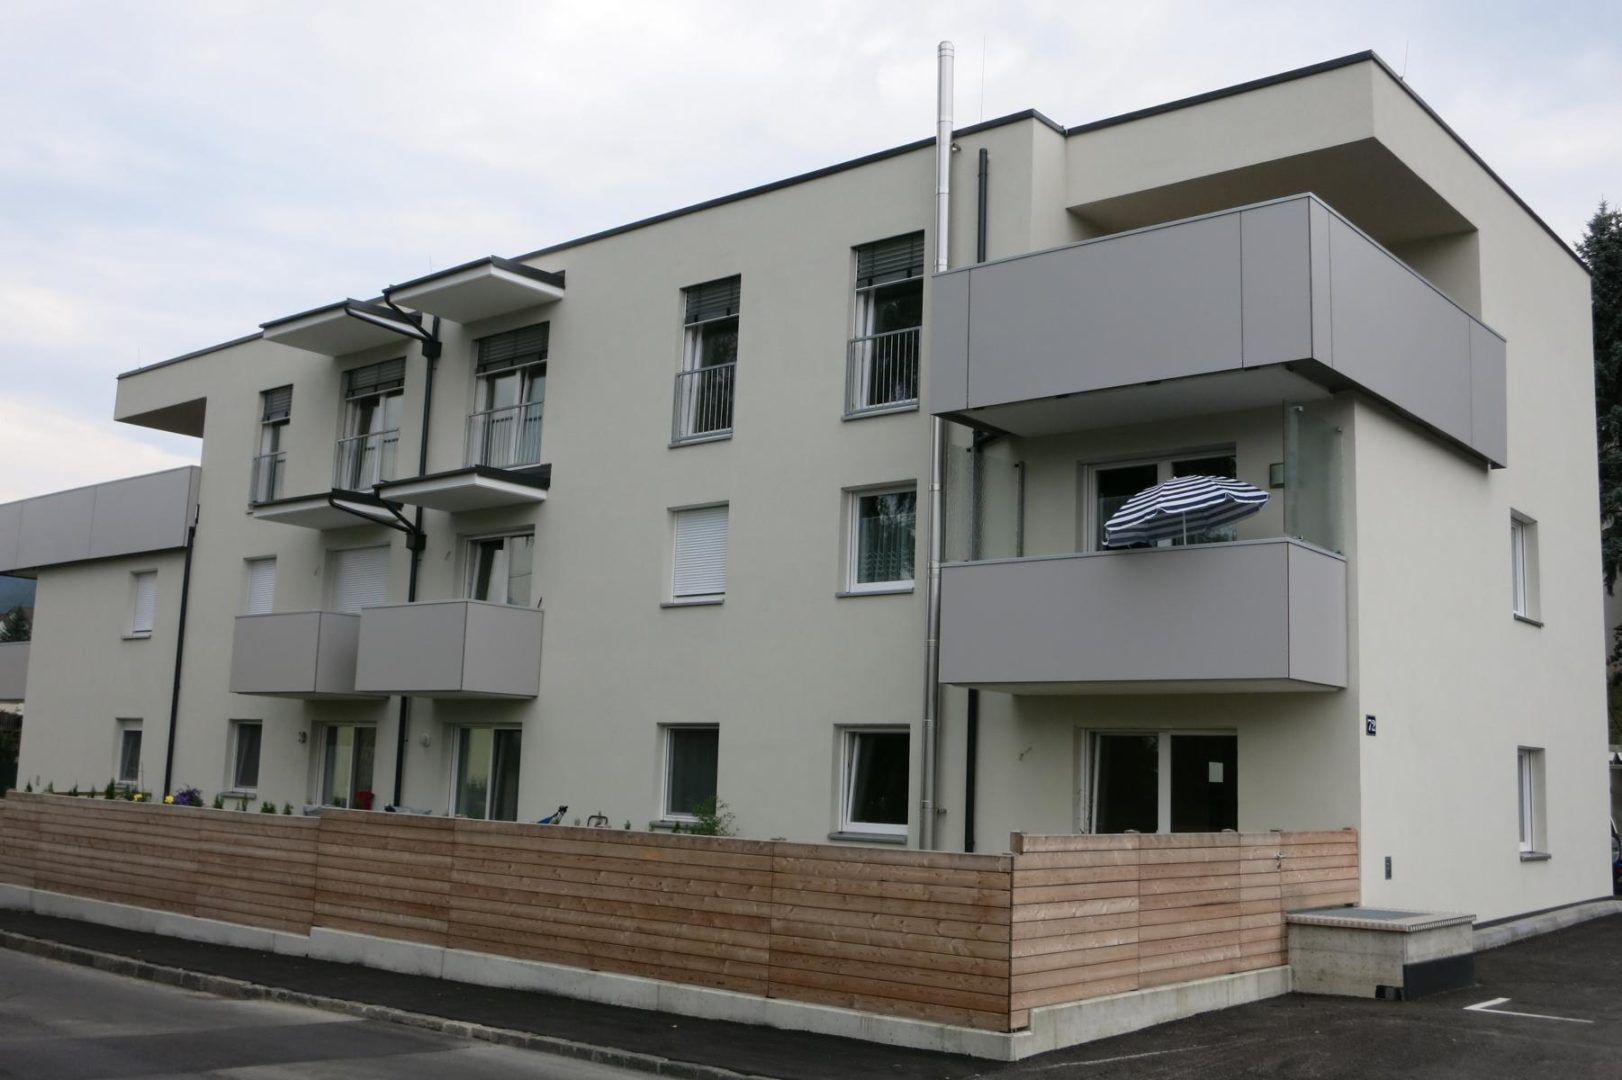 Mietwohnung Villach-Völkendorf